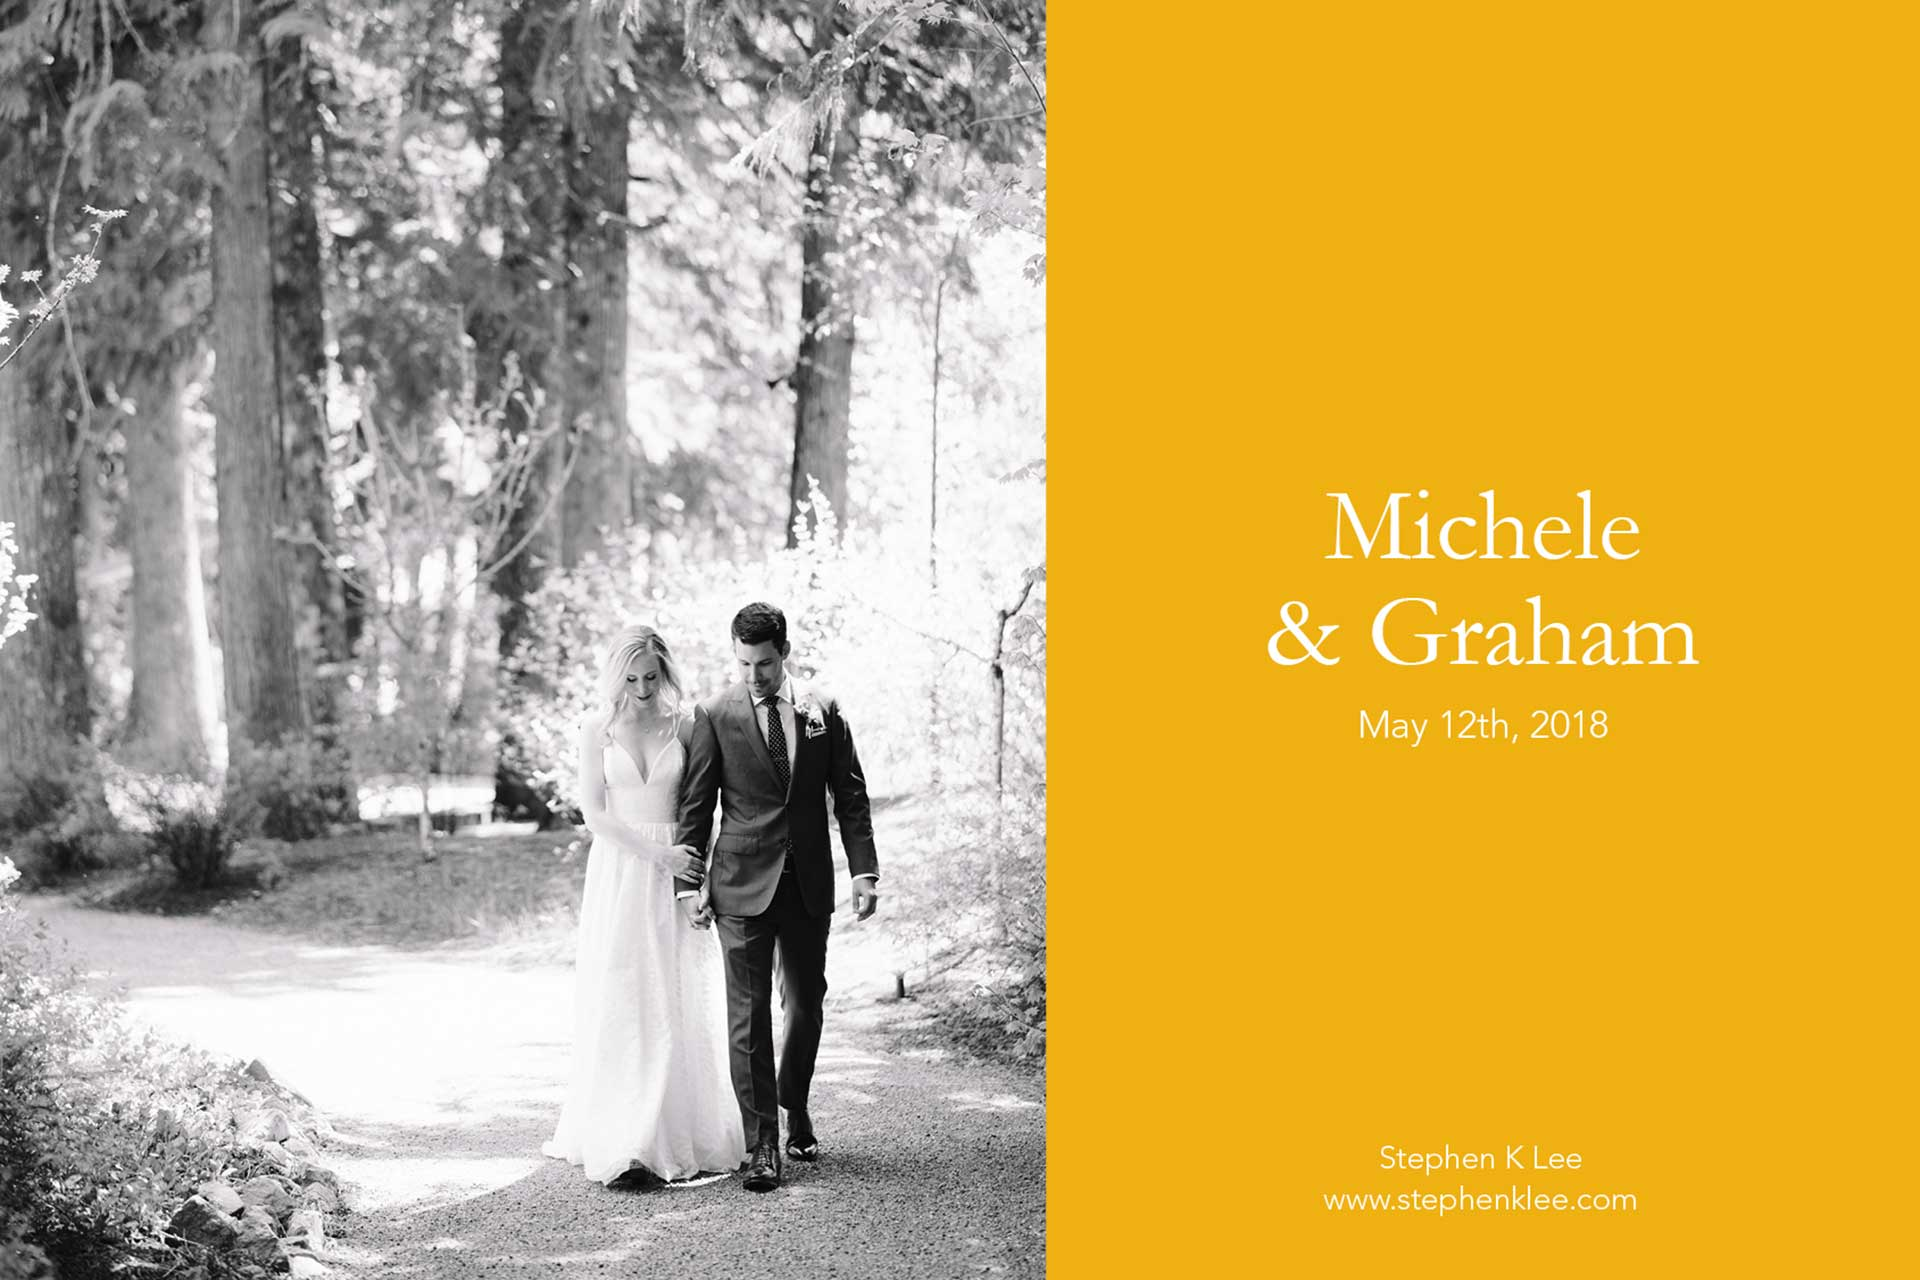 Michele and Graham's Wedding